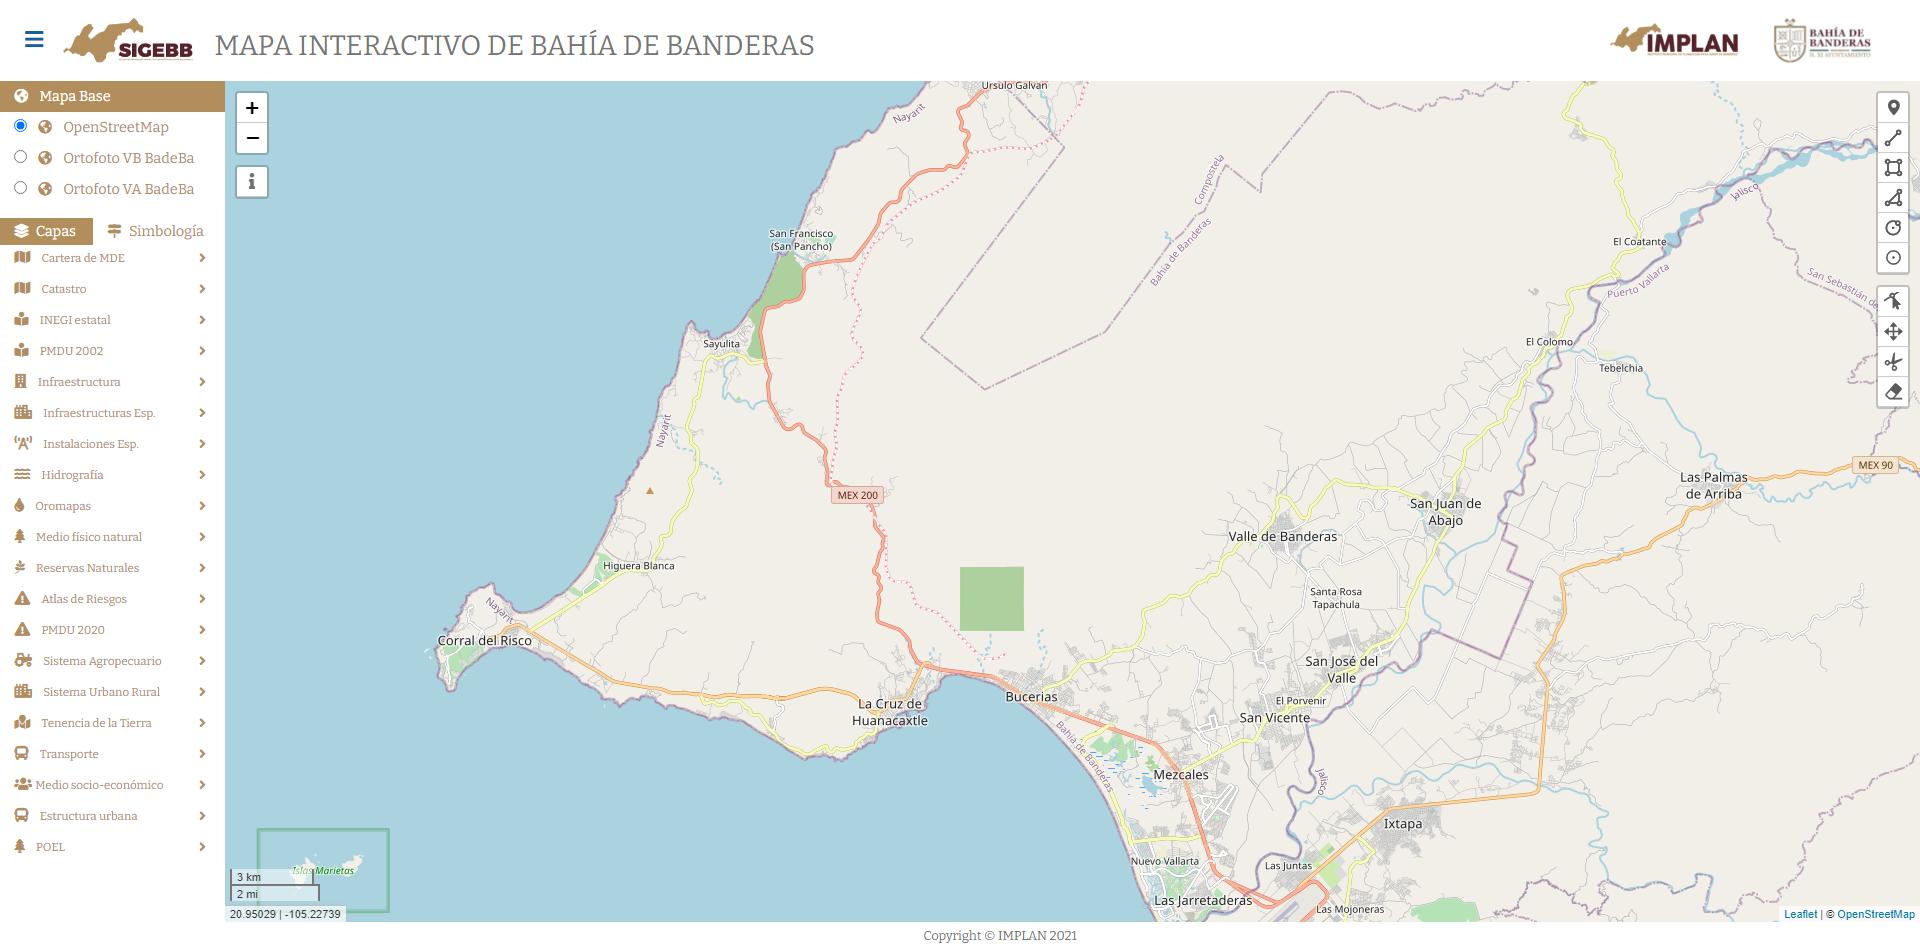 Mapa Interactivo